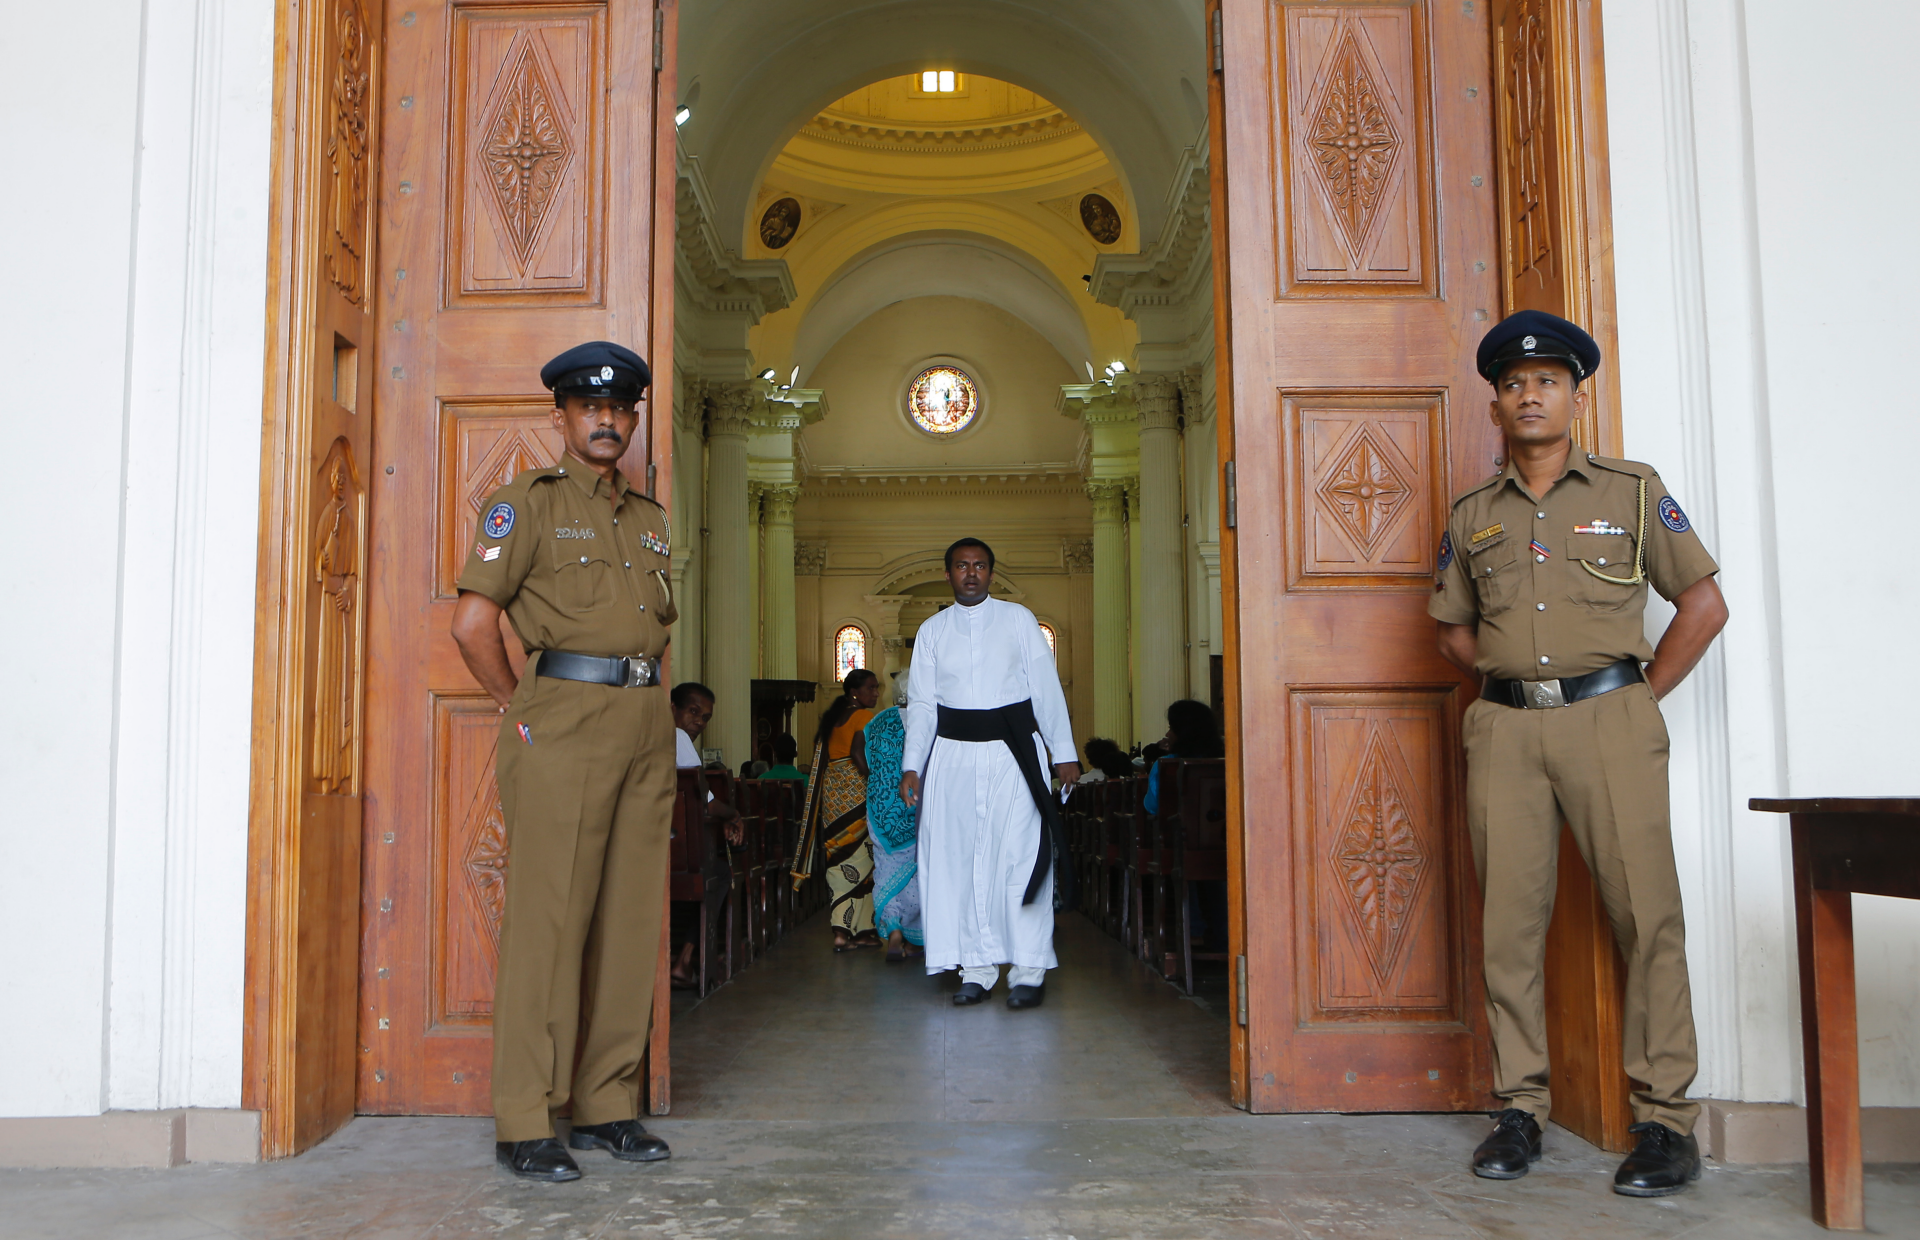 Westlake Legal Group ContentBroker_contentid-b20c12c070b741f78c3399dbb5ee0f40 Sri Lanka Catholics hold 1st Sunday Mass since attacks fox-news/world/world-regions/asia fox-news/world/terrorism fox-news/world fnc/world fnc COLOMBO, Sri Lanka Associated Press article 96625e12-3f56-5266-a60d-ce06cfae5bef